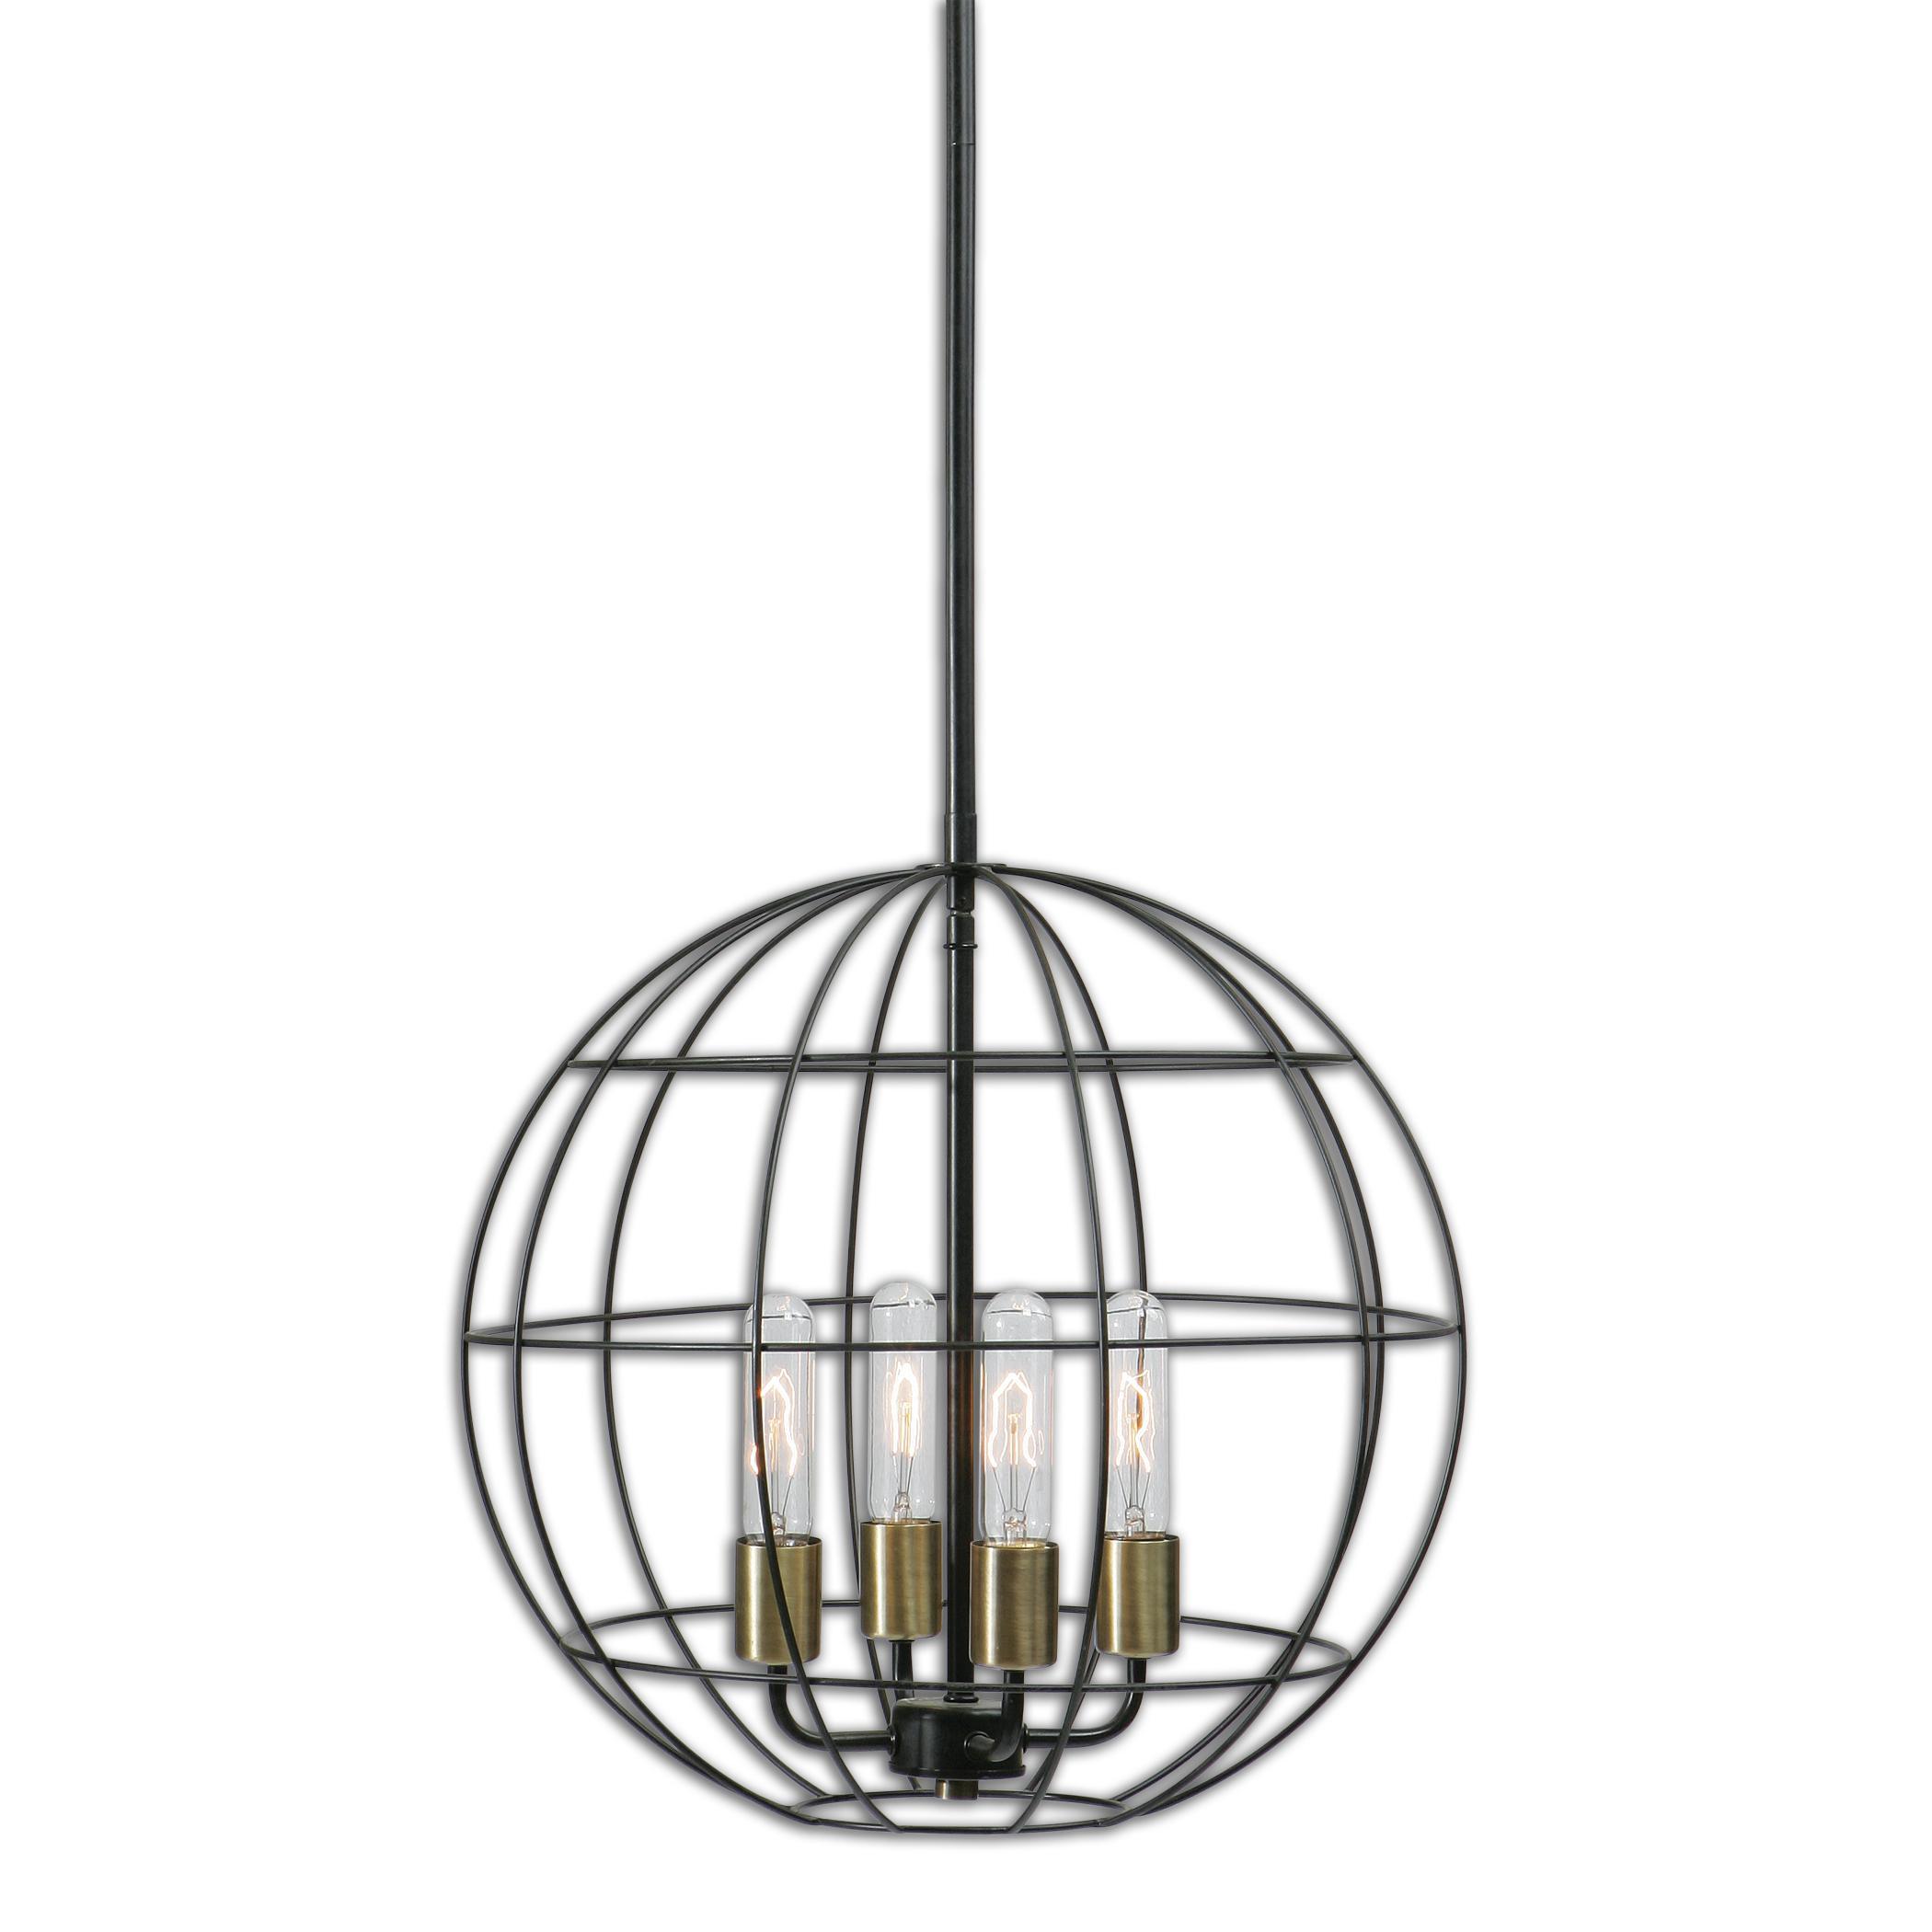 Uttermost Lighting Fixtures Uttermost Palla 4 Light Sphere Pendant - Item Number: 22023